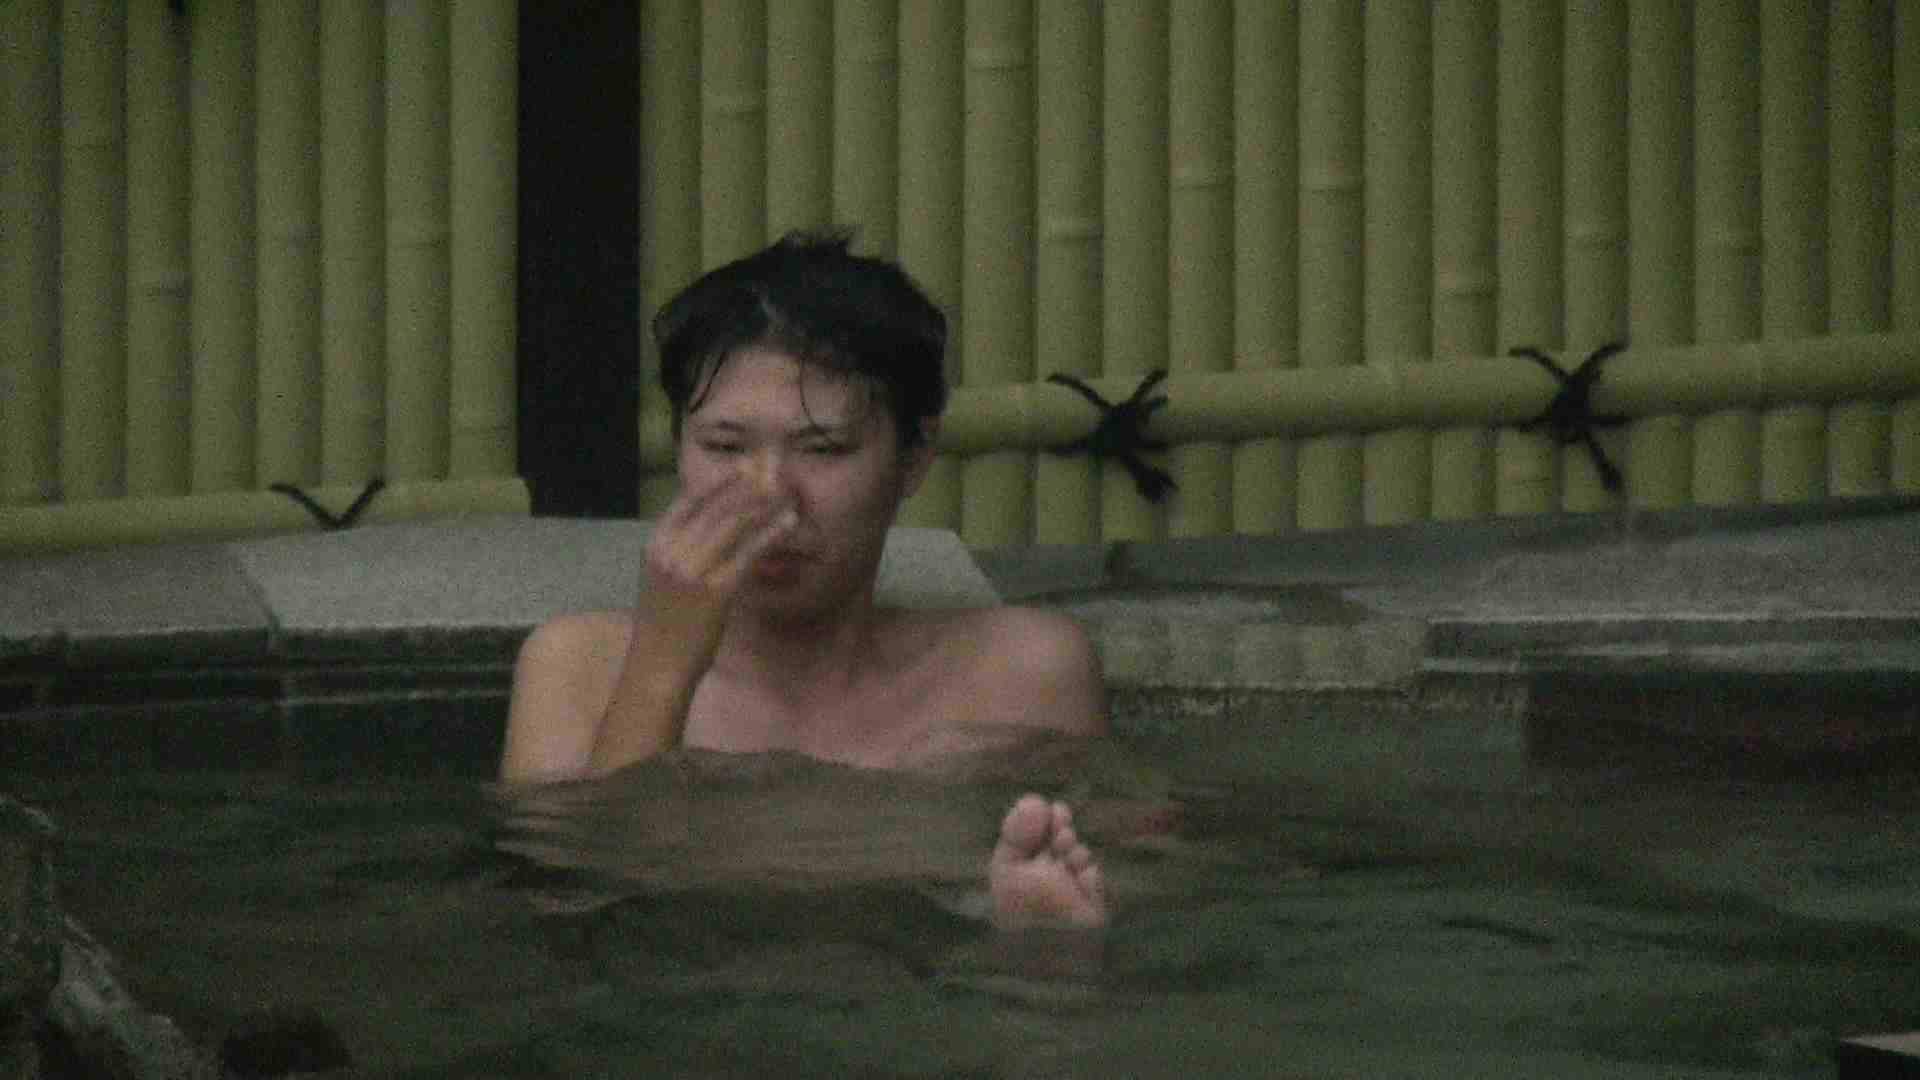 Aquaな露天風呂Vol.215 盗撮 おまんこ無修正動画無料 106枚 47